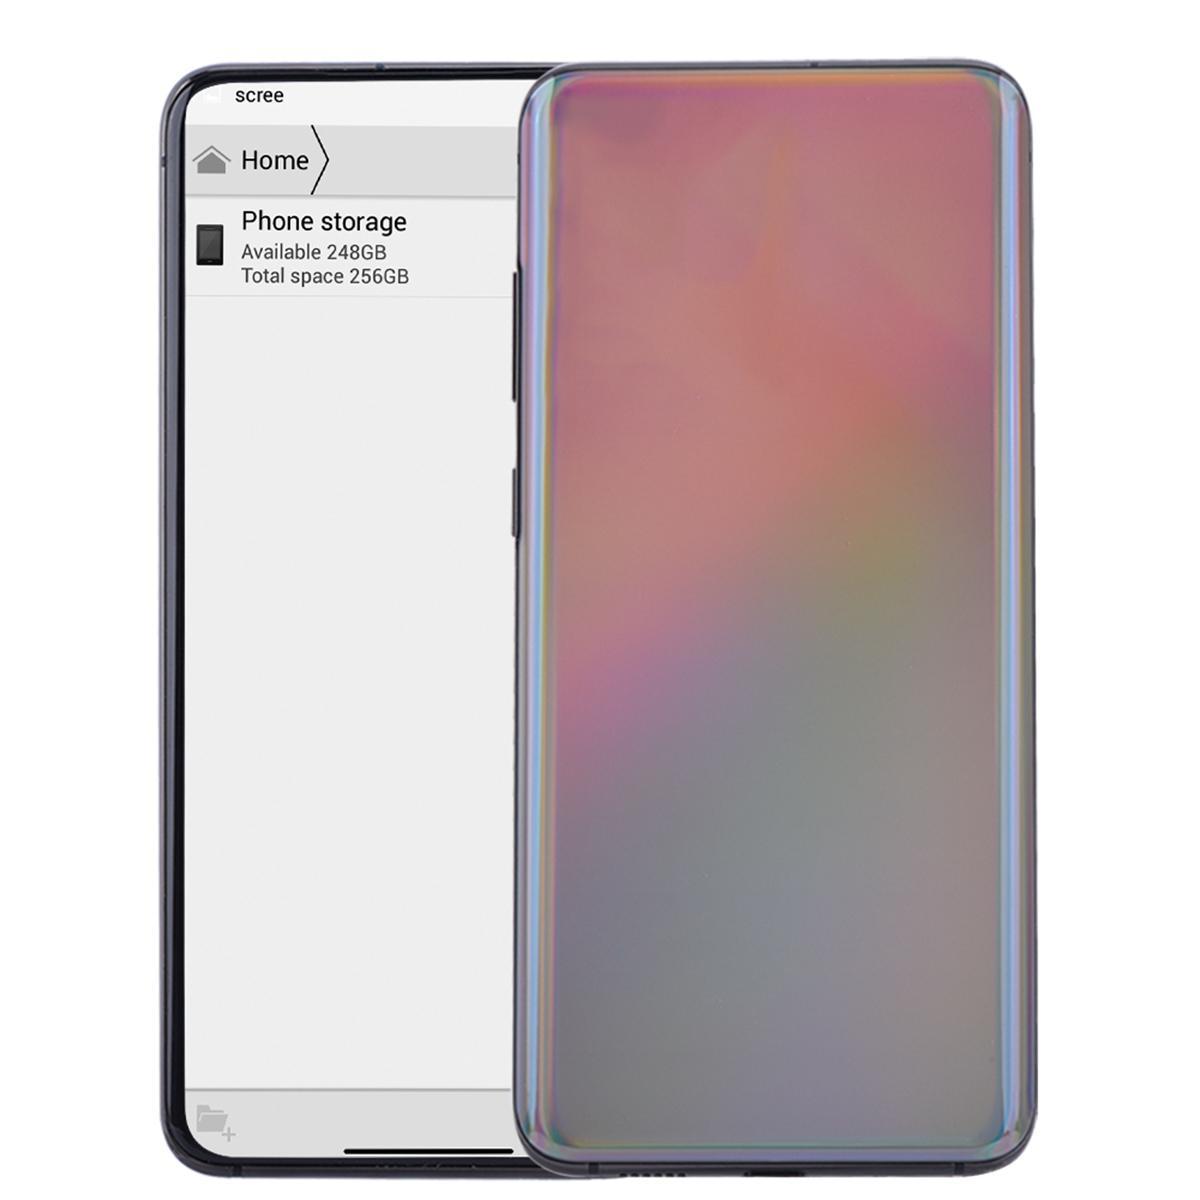 2020 New 1GB 8GB Goophone S20U GPS20 Ultra 5G In-display Fingerprint Face ID Android 10 6.9 inch IPS Full Screen Quad Core 3G 4G Smart Phone